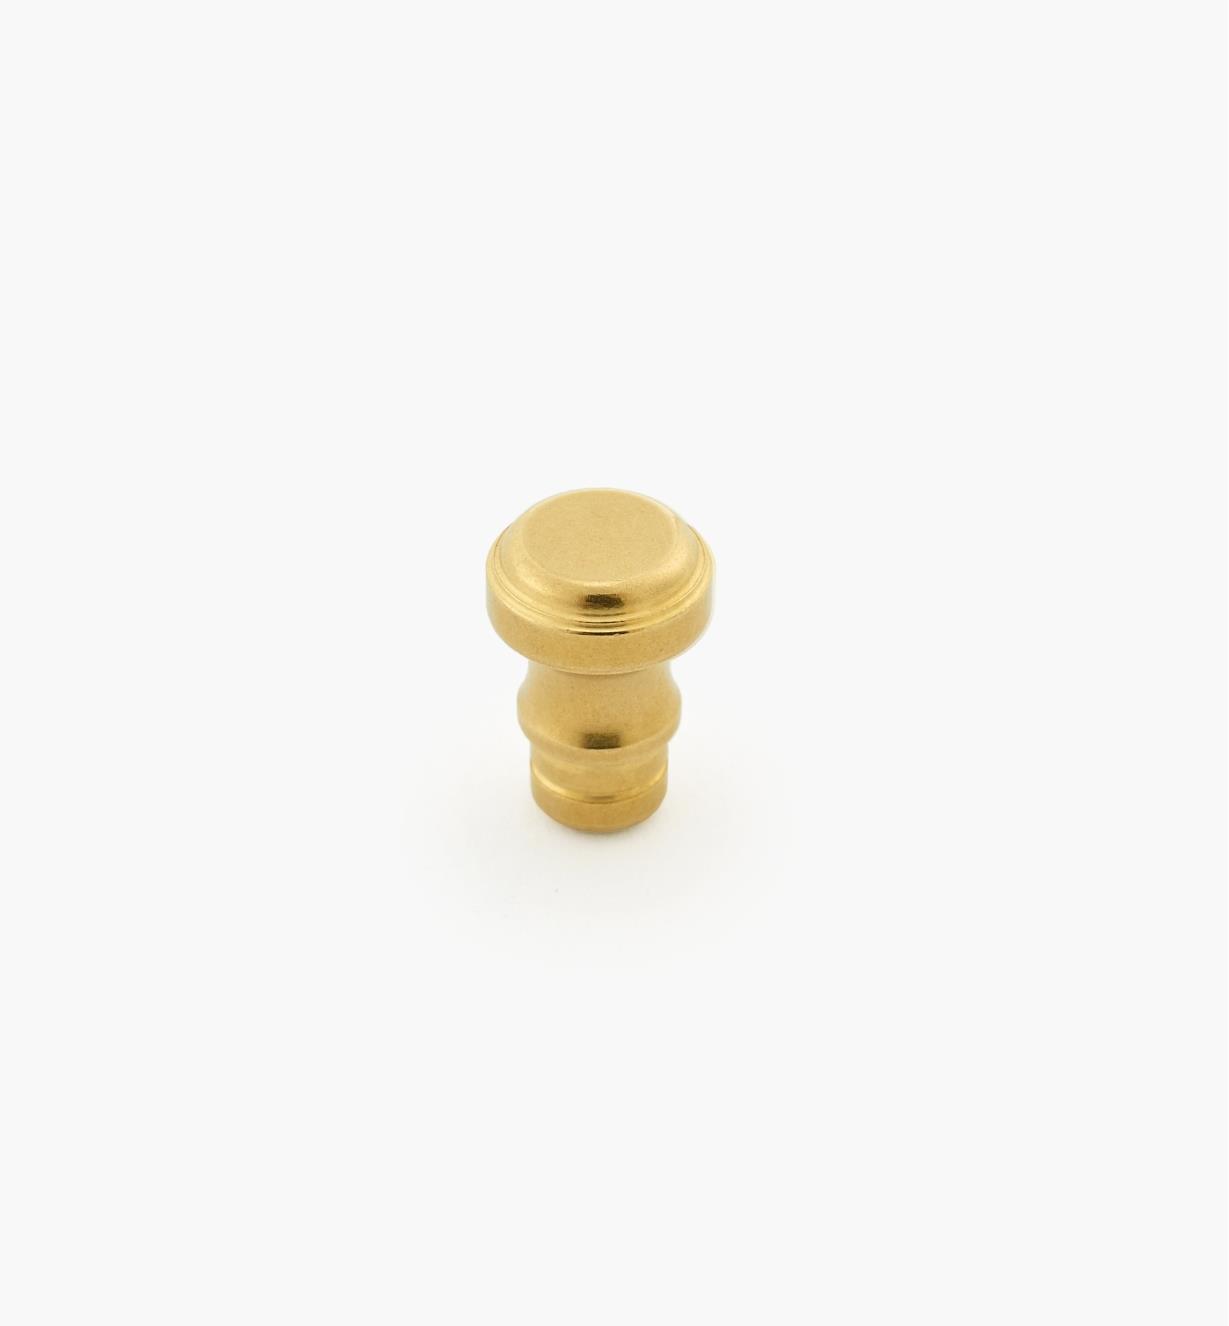 "01B1122 - 5/16"" x  3/16"" Brass Knob"